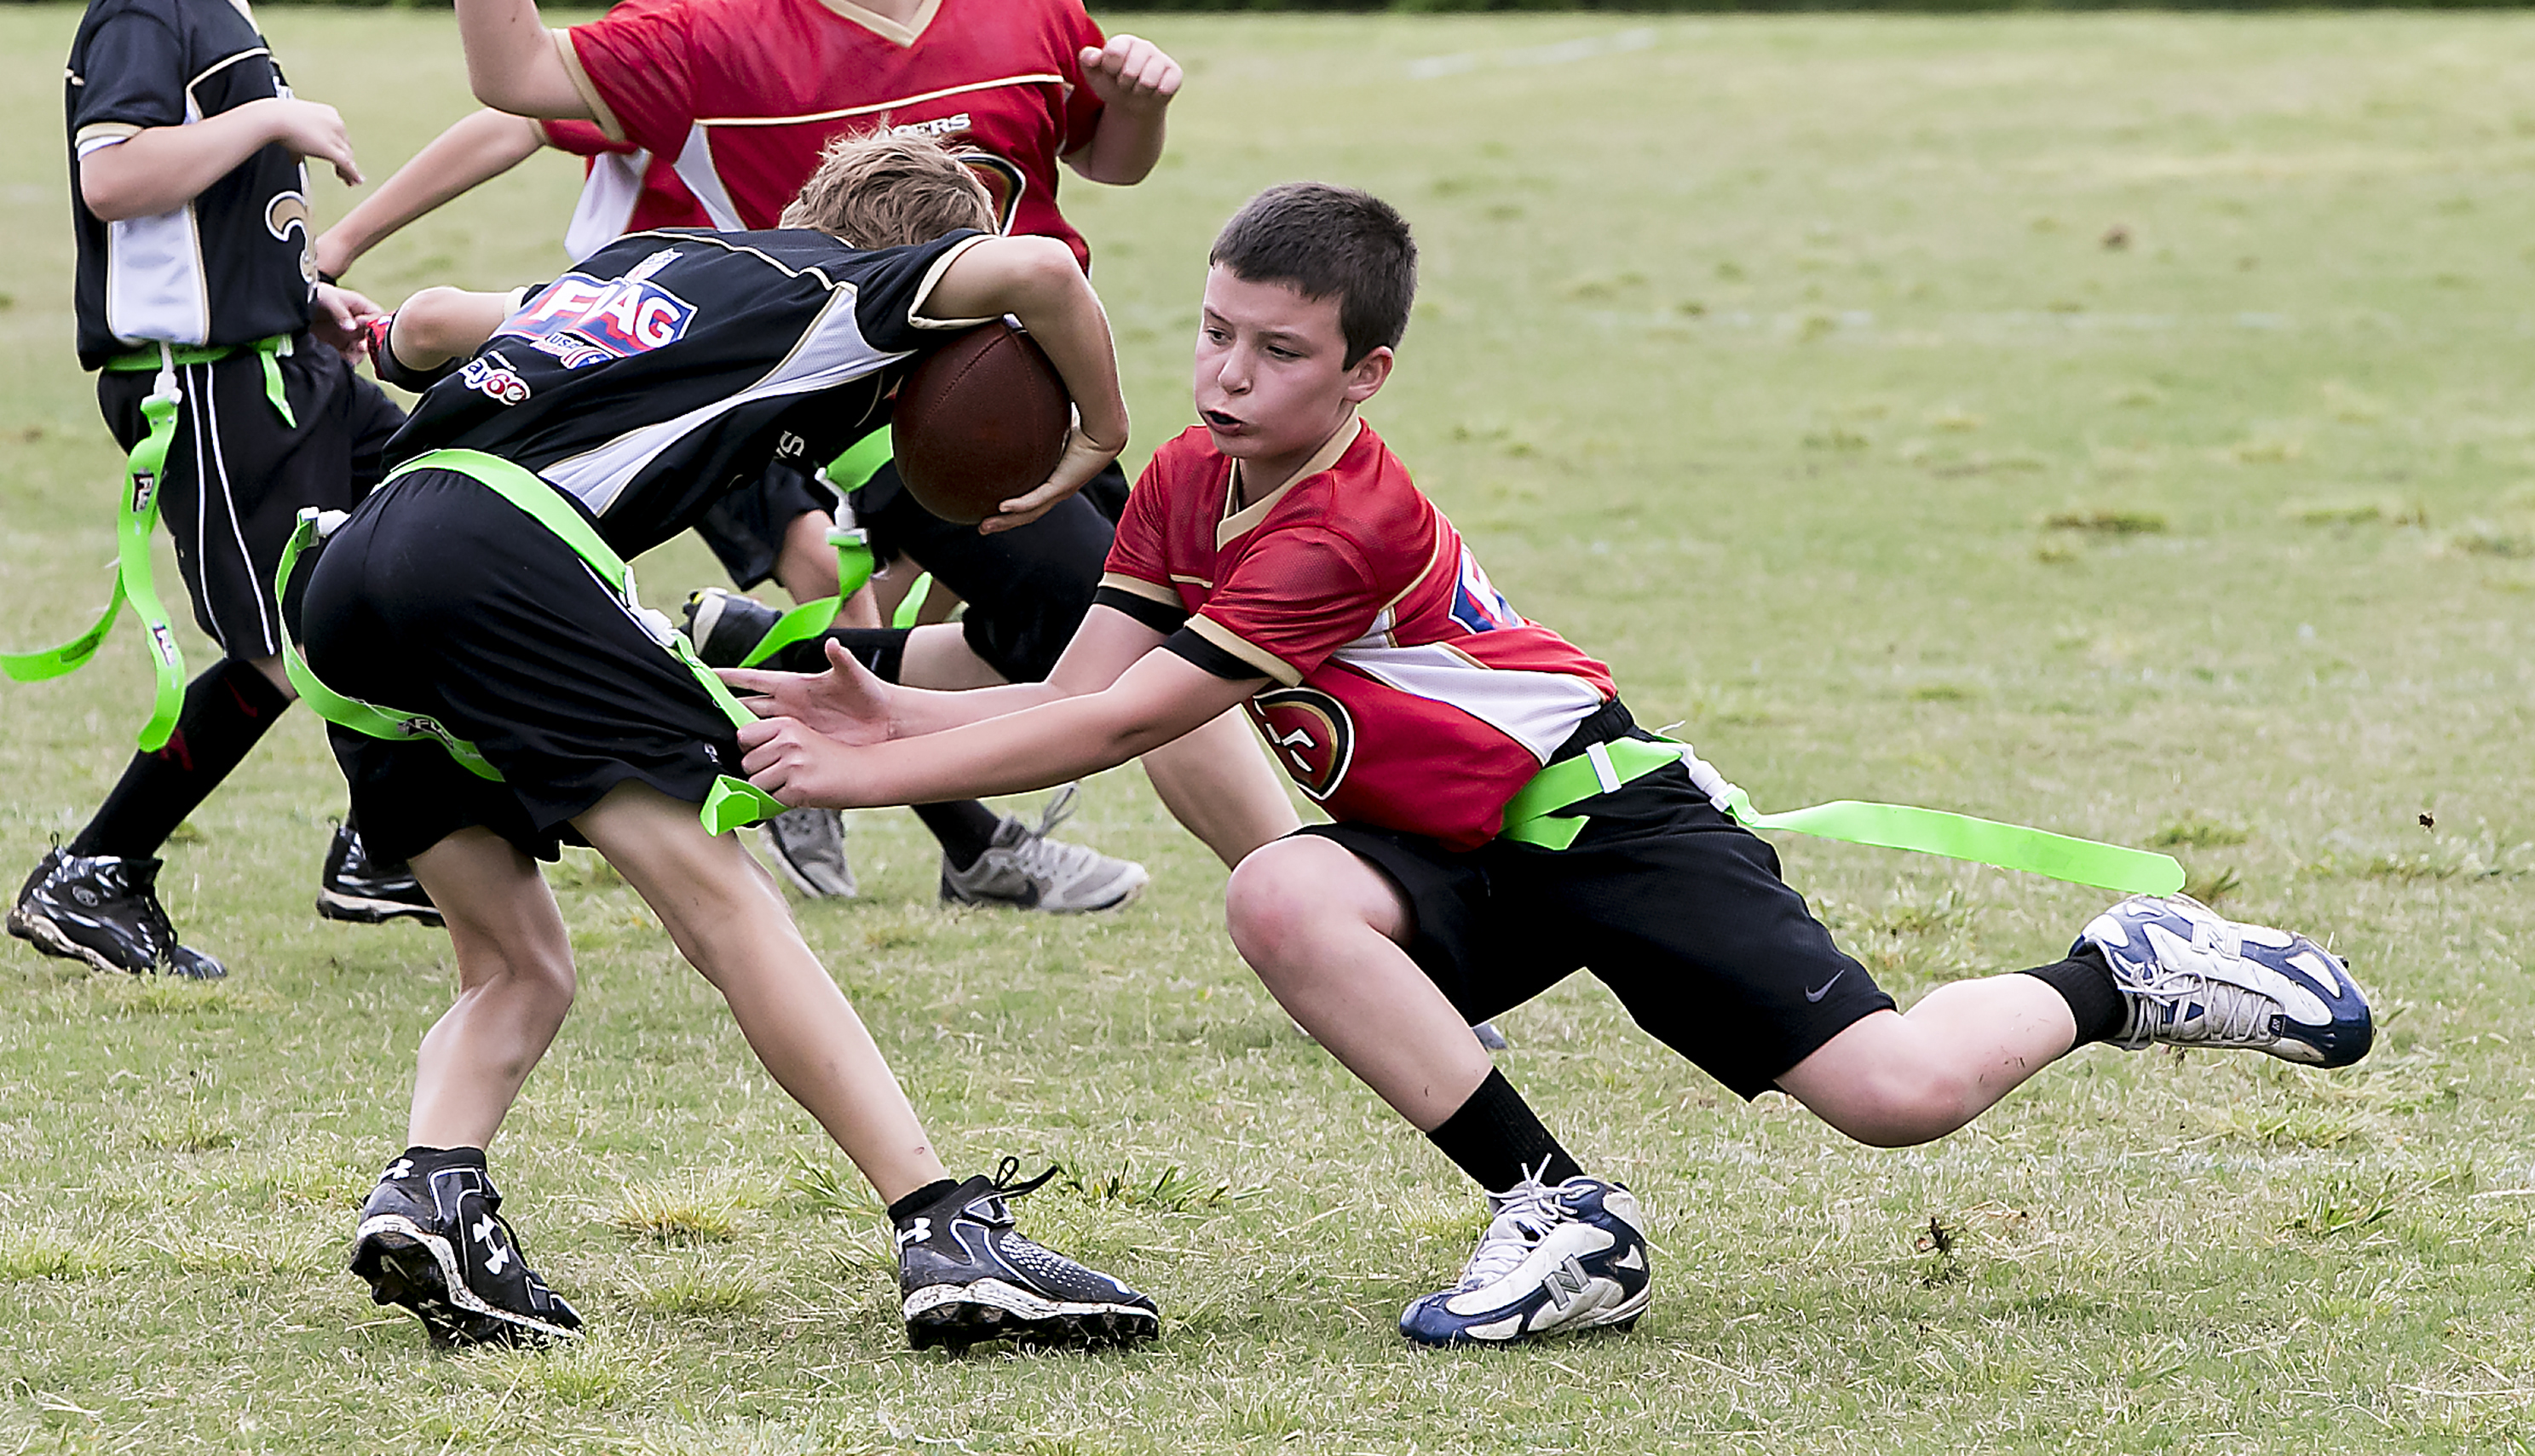 youth sports murfreesboro positive bw